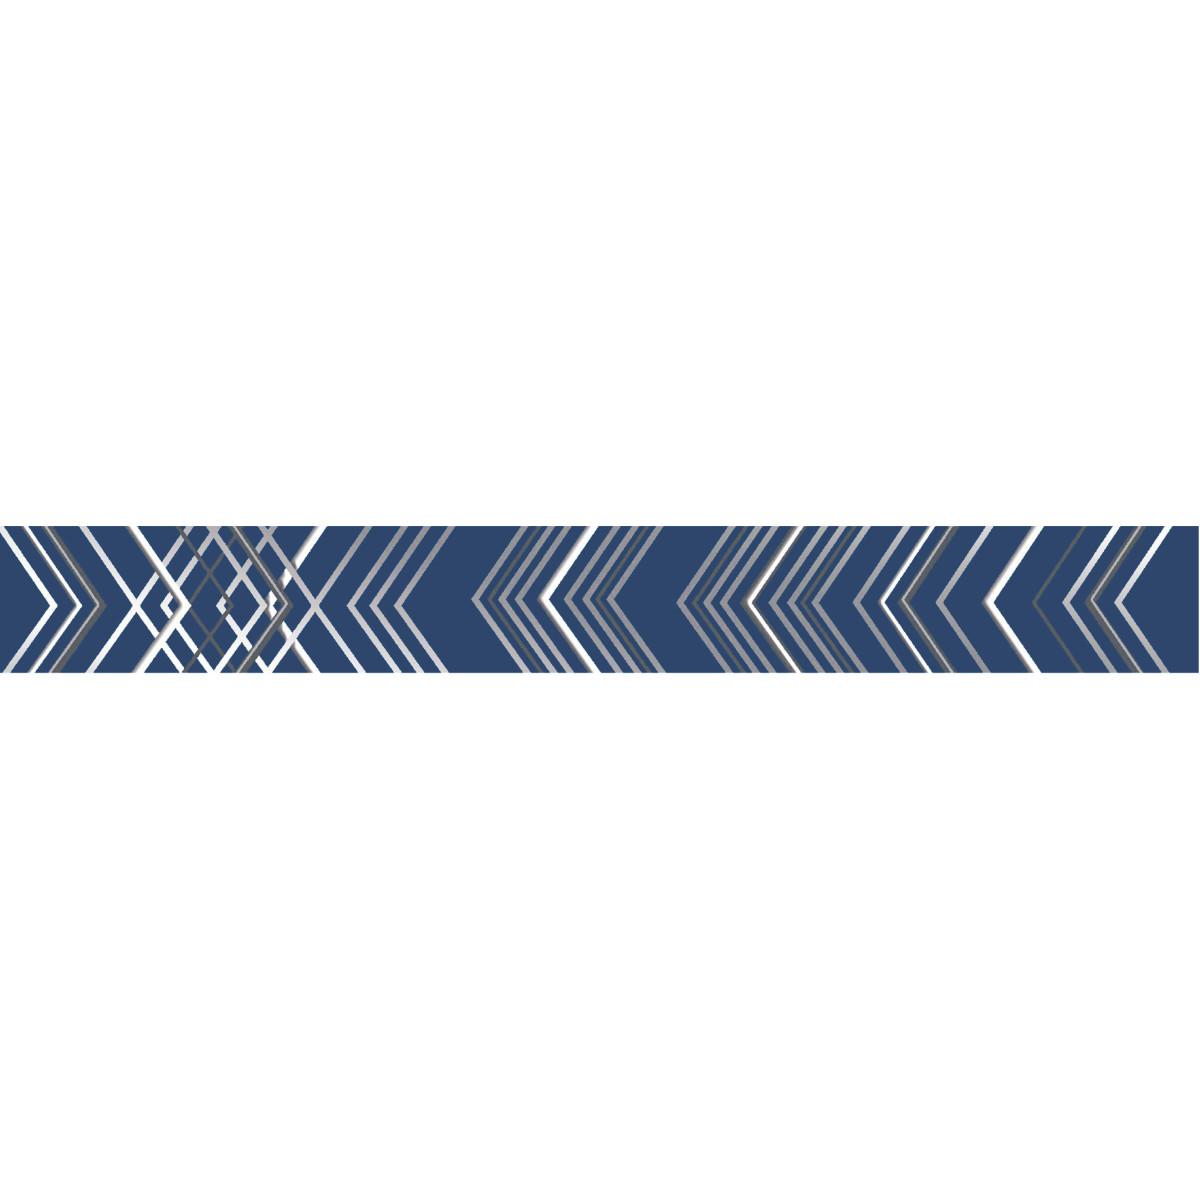 Бордюр настенный Azori «Festa» 50.6x6.2 см цвет синий индиго